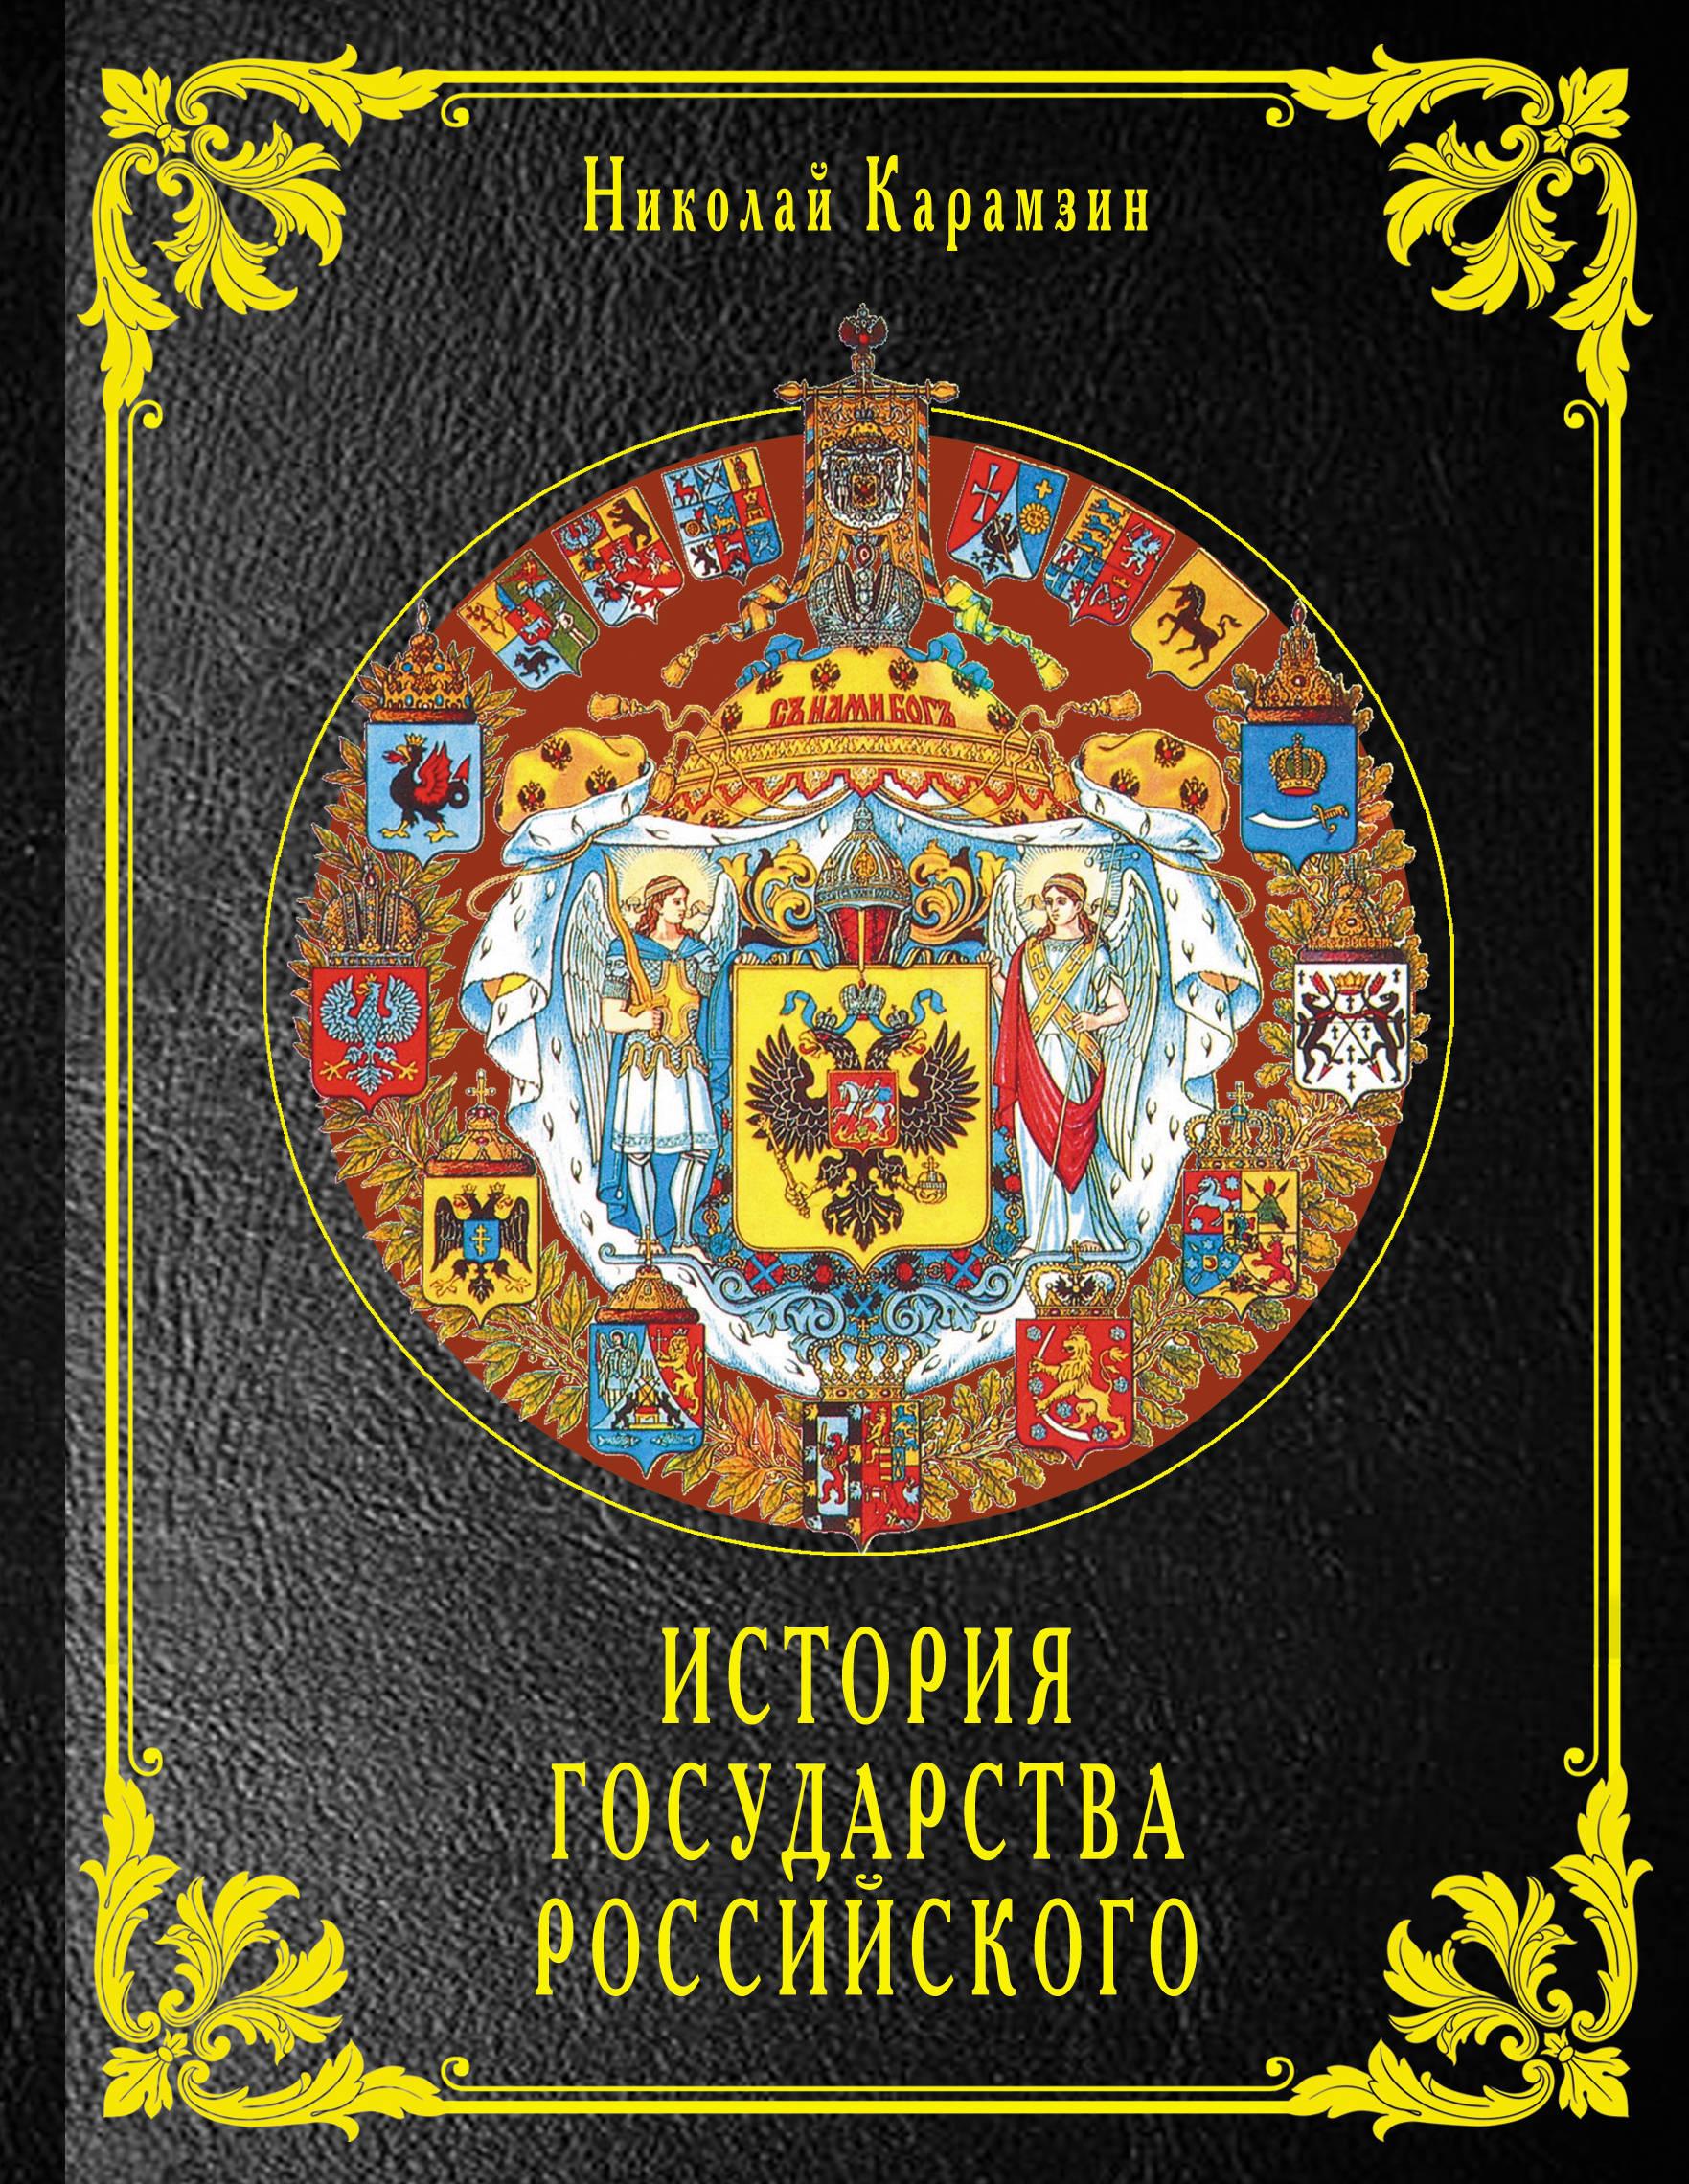 Карамзин Николай Михайлович История государства Российского хочу карамзина история государства российского